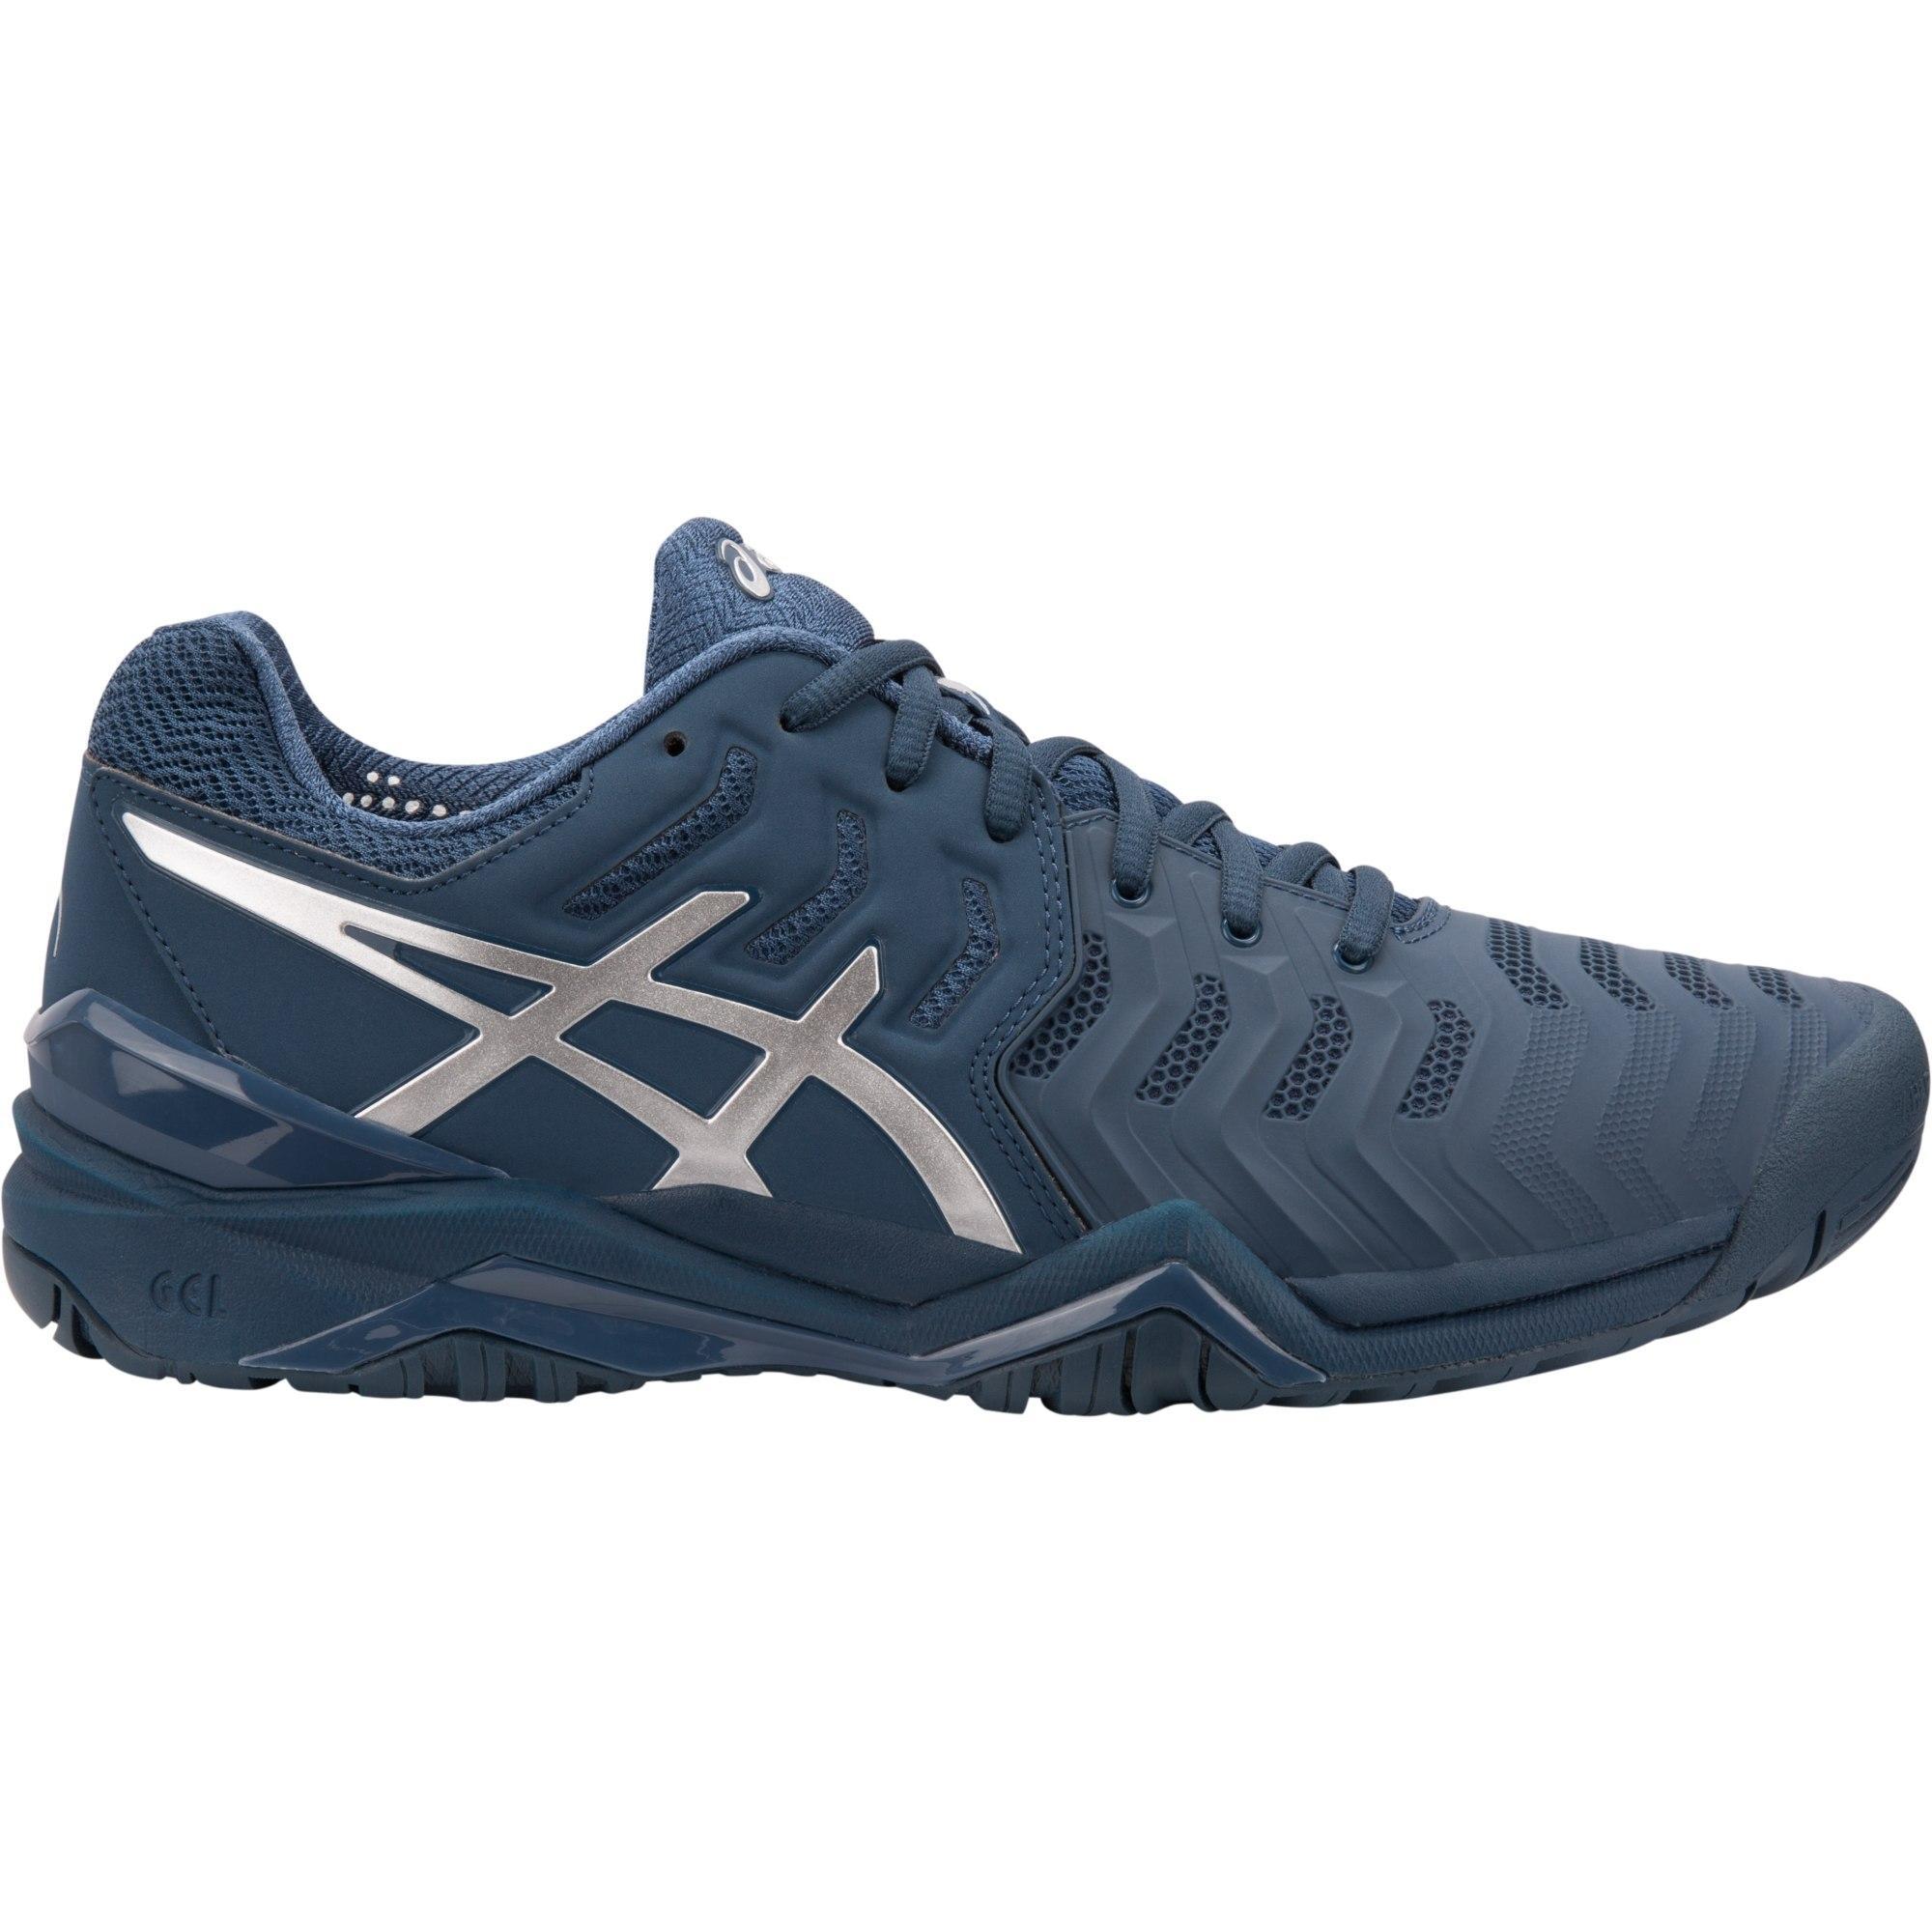 19a18a07 Asics Mens GEL-Resolution Novak Tennis Shoes - Peacoat/Silver